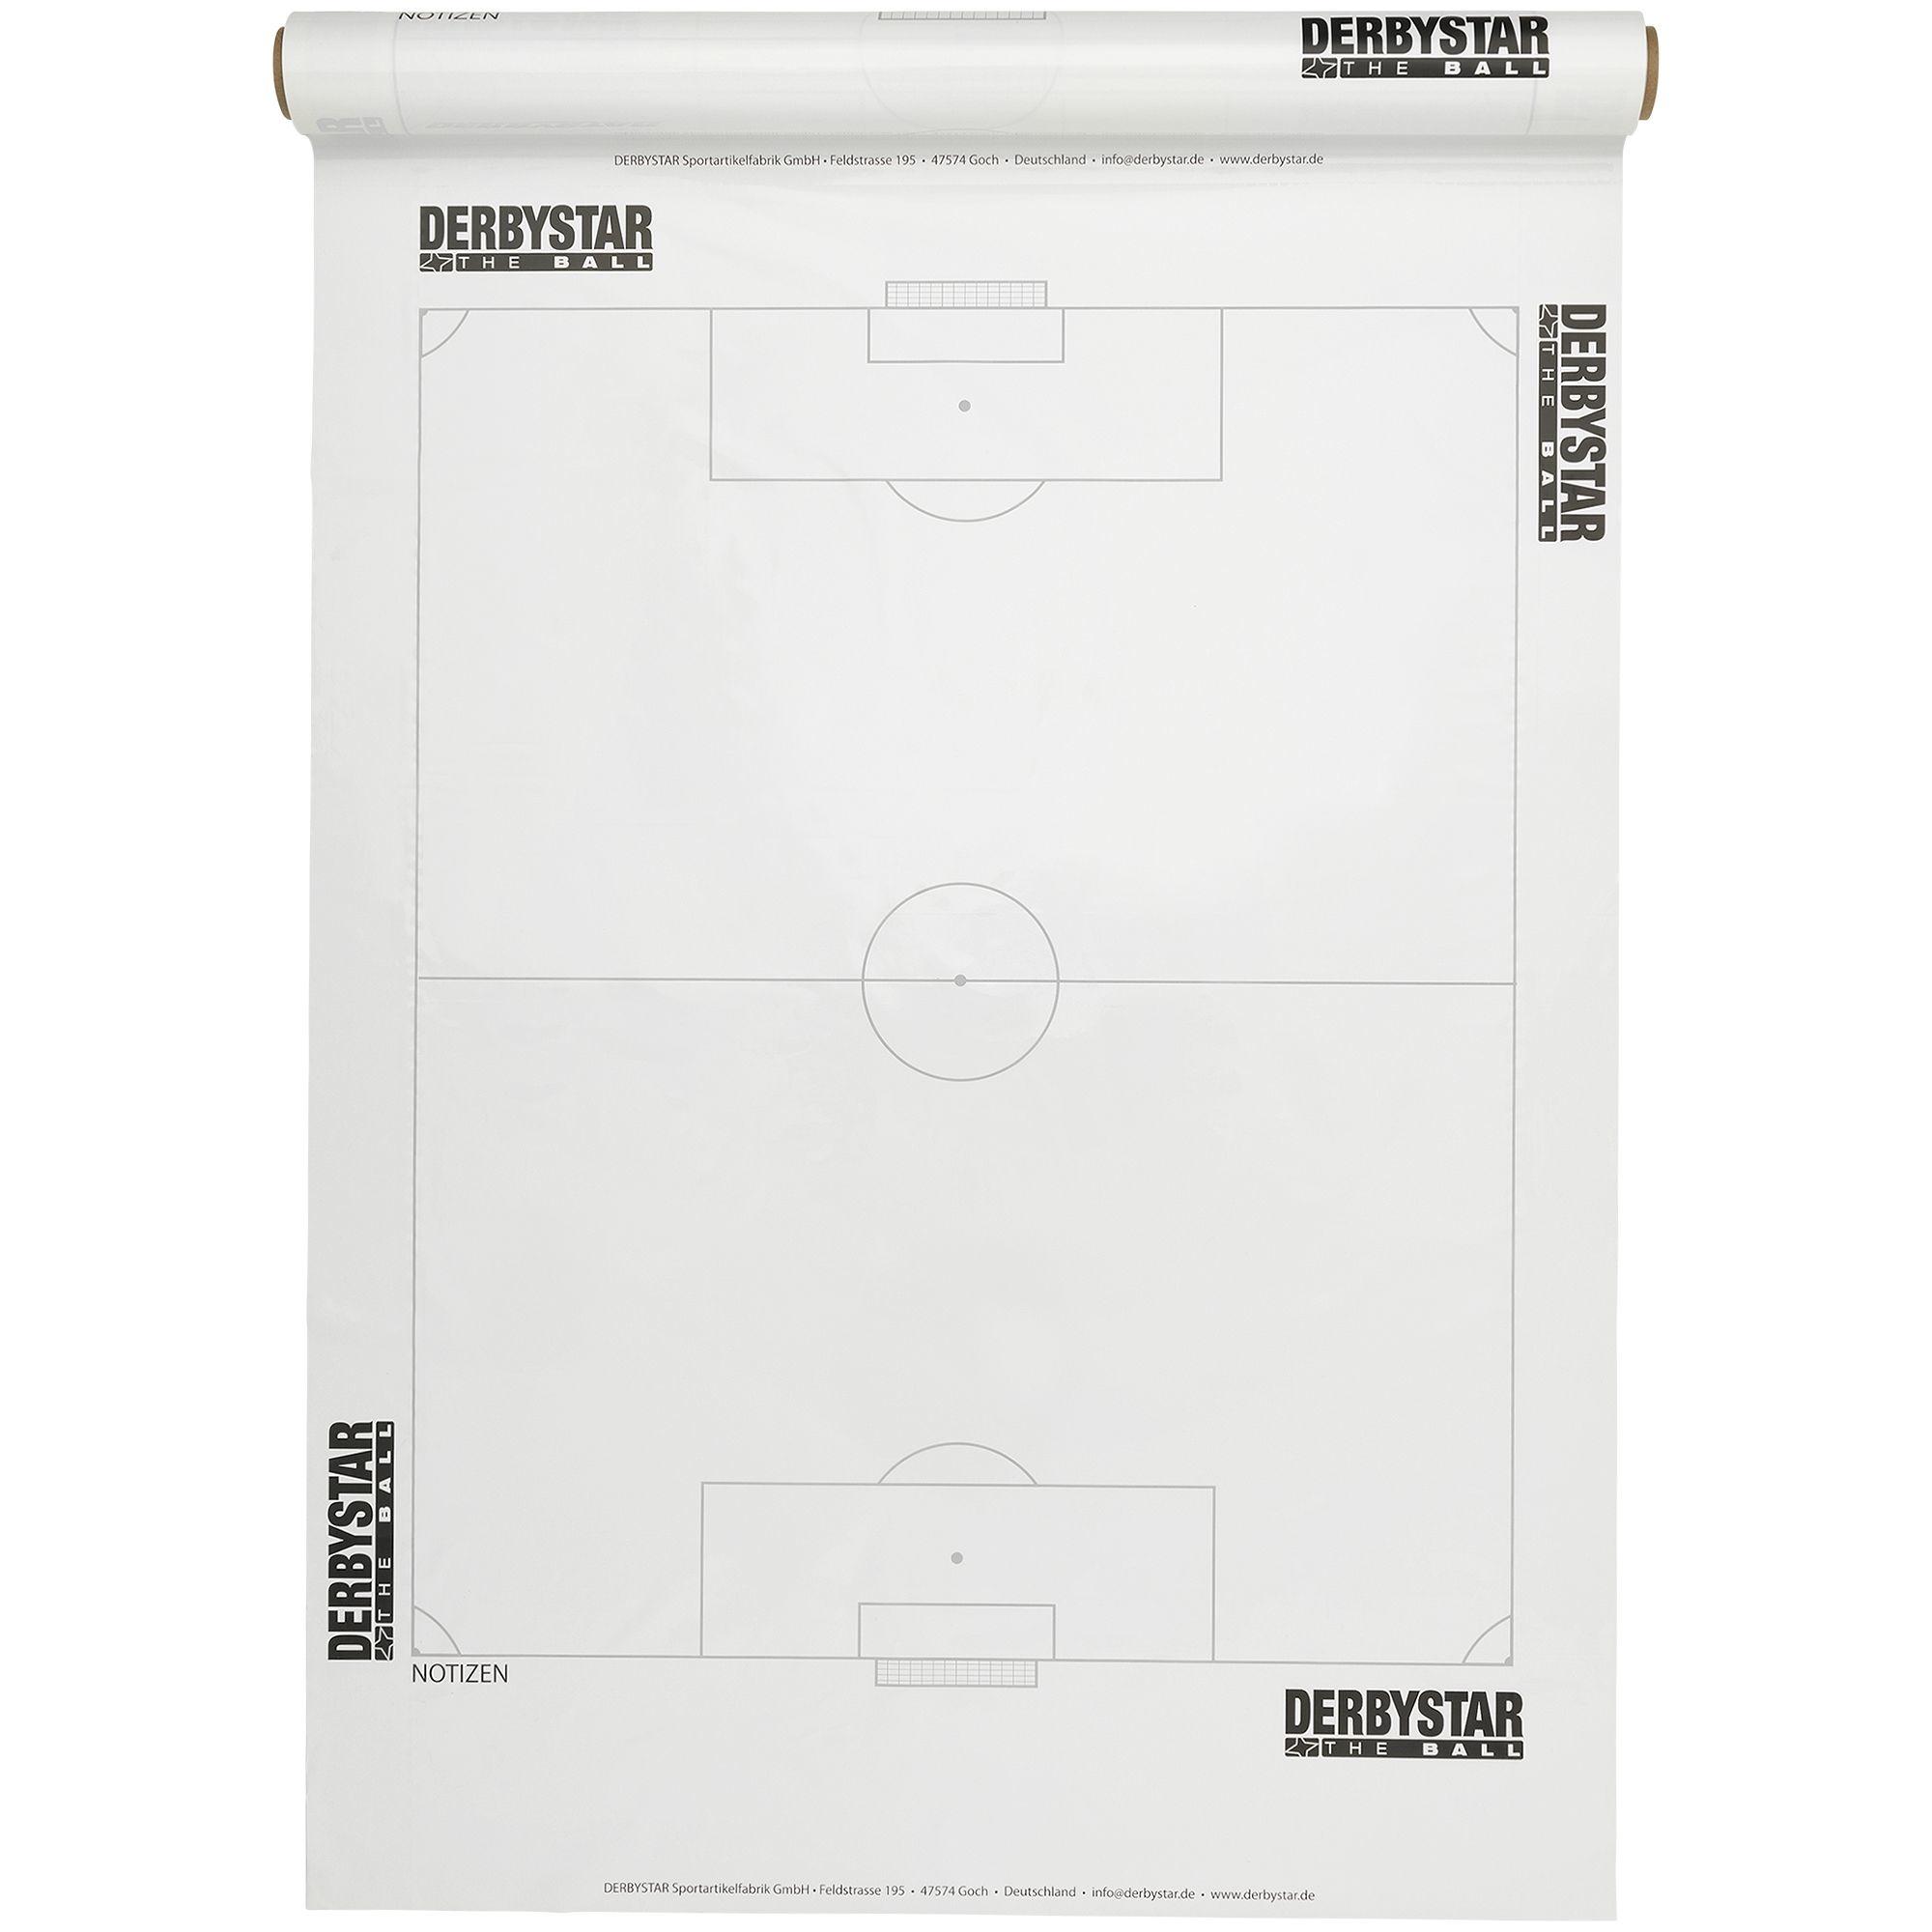 Derbystar Tactiekfolie Voetbal